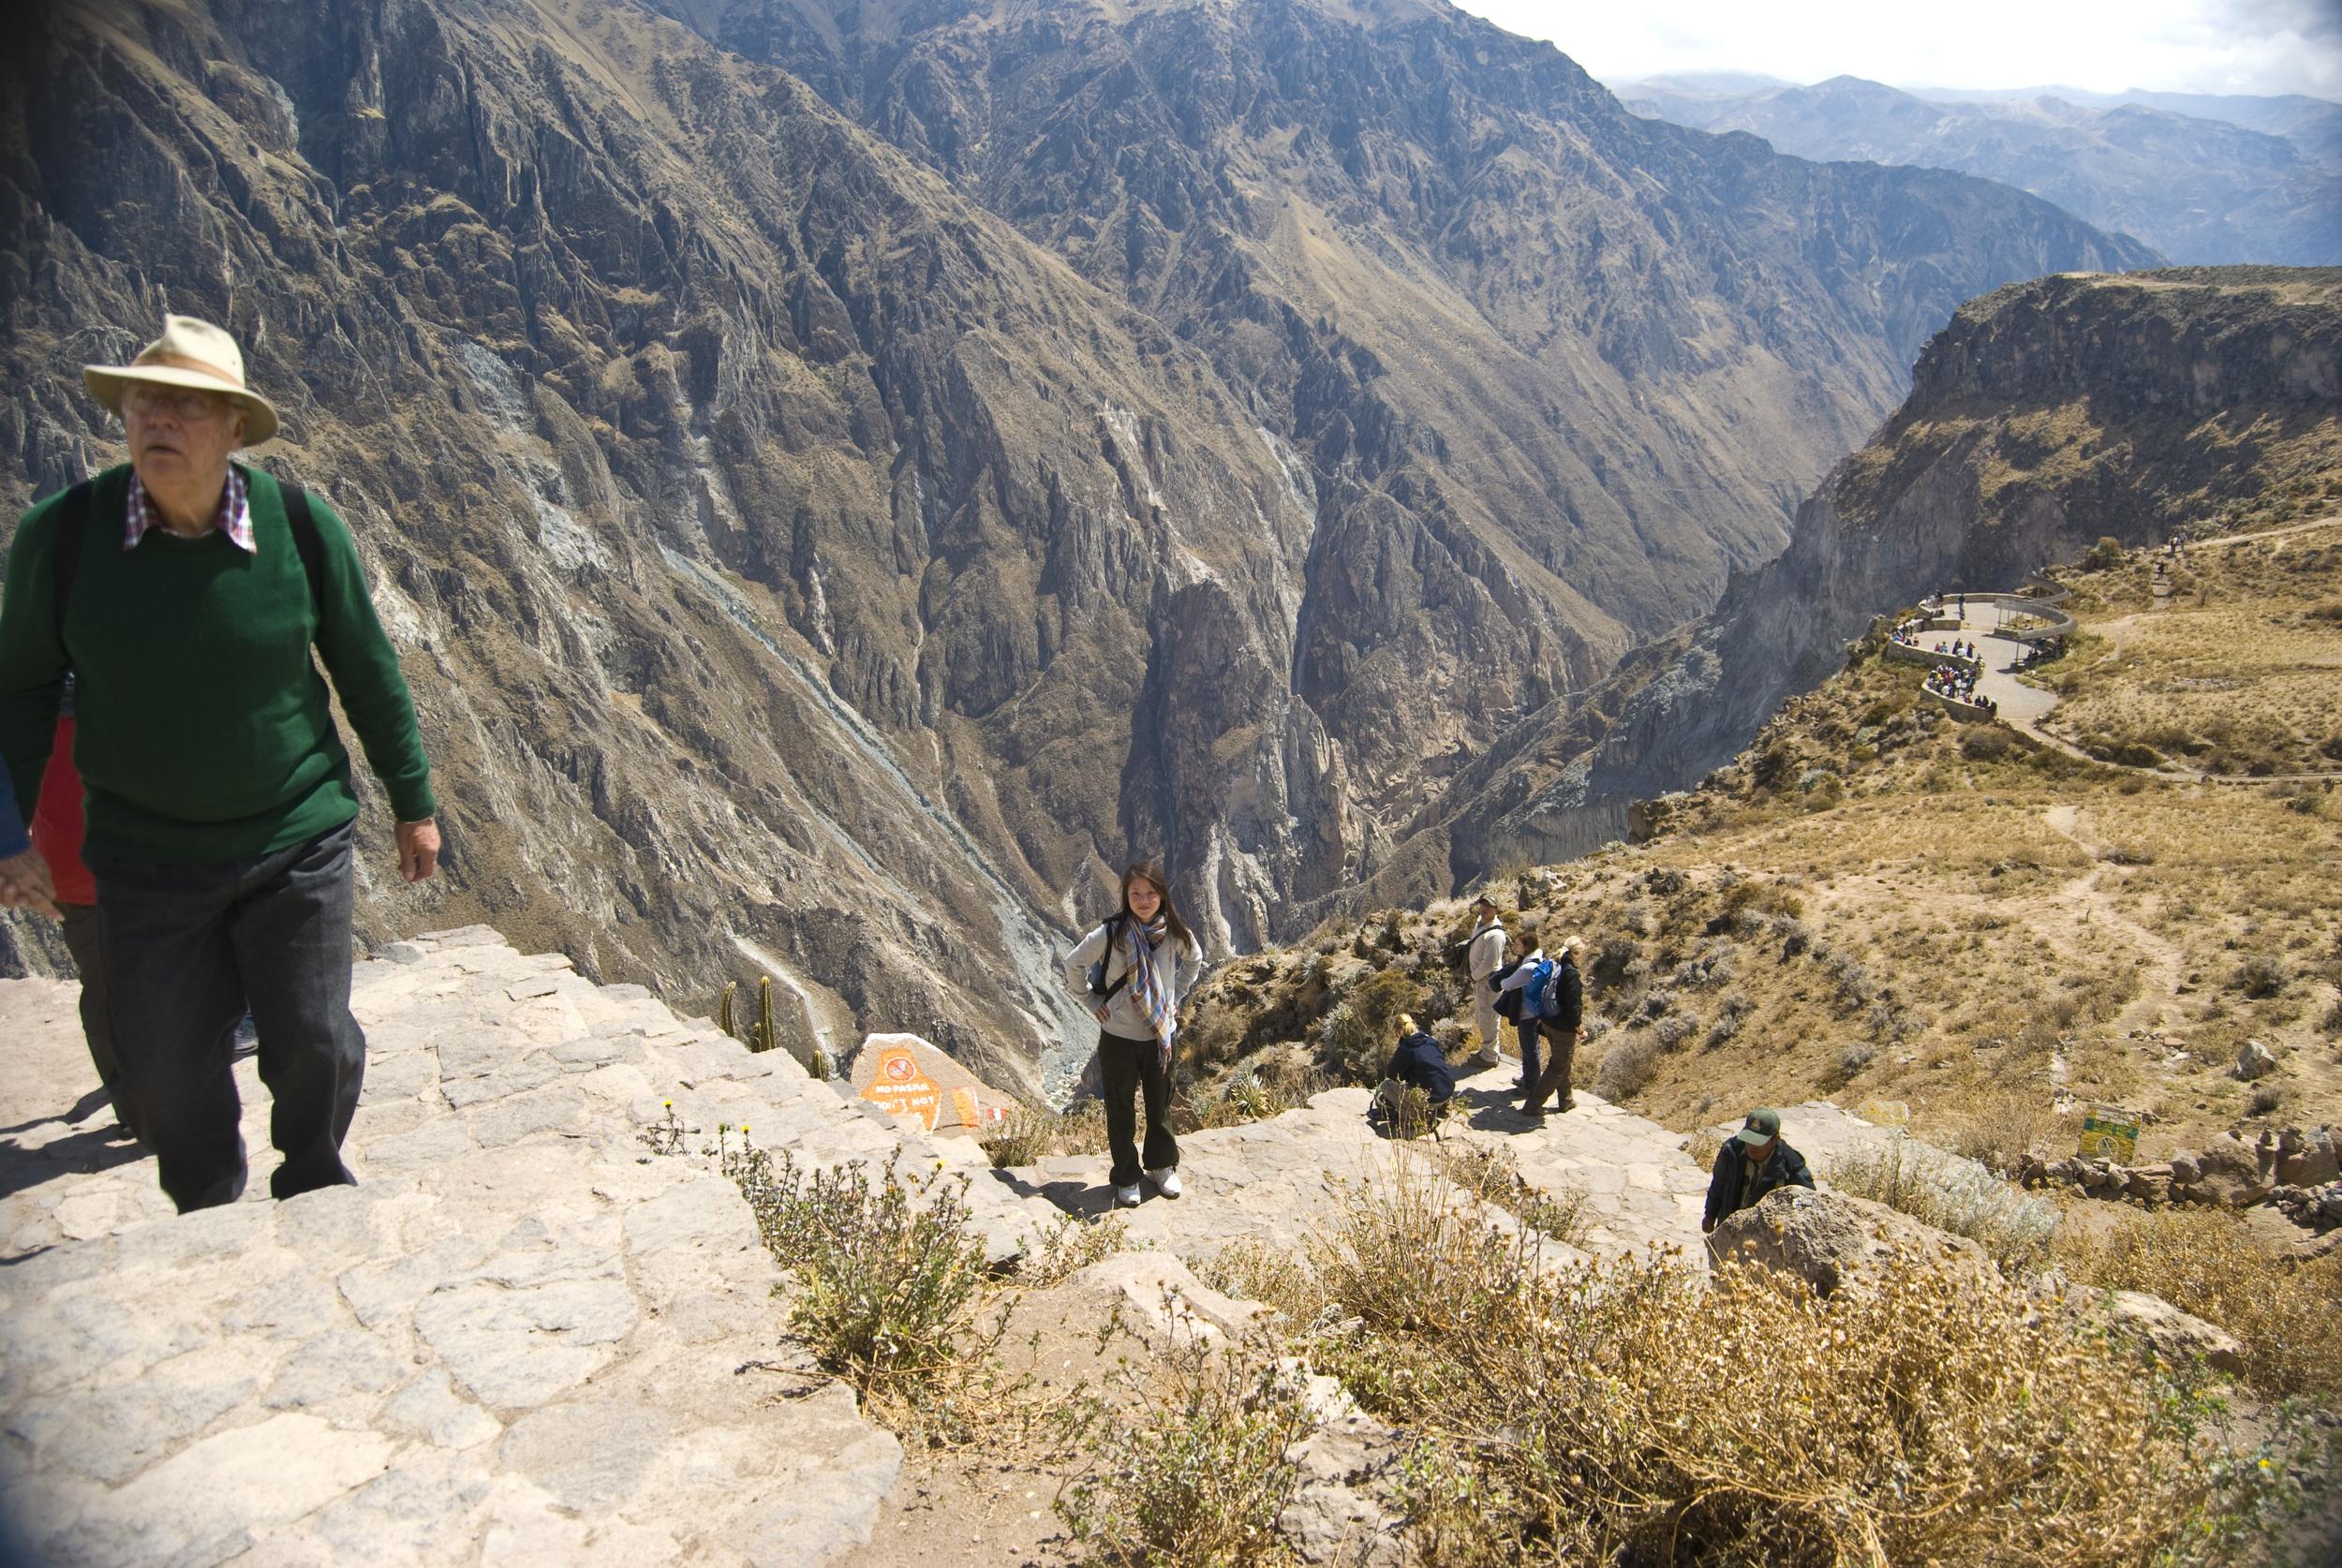 colca-canyon_4121703179_o.jpg